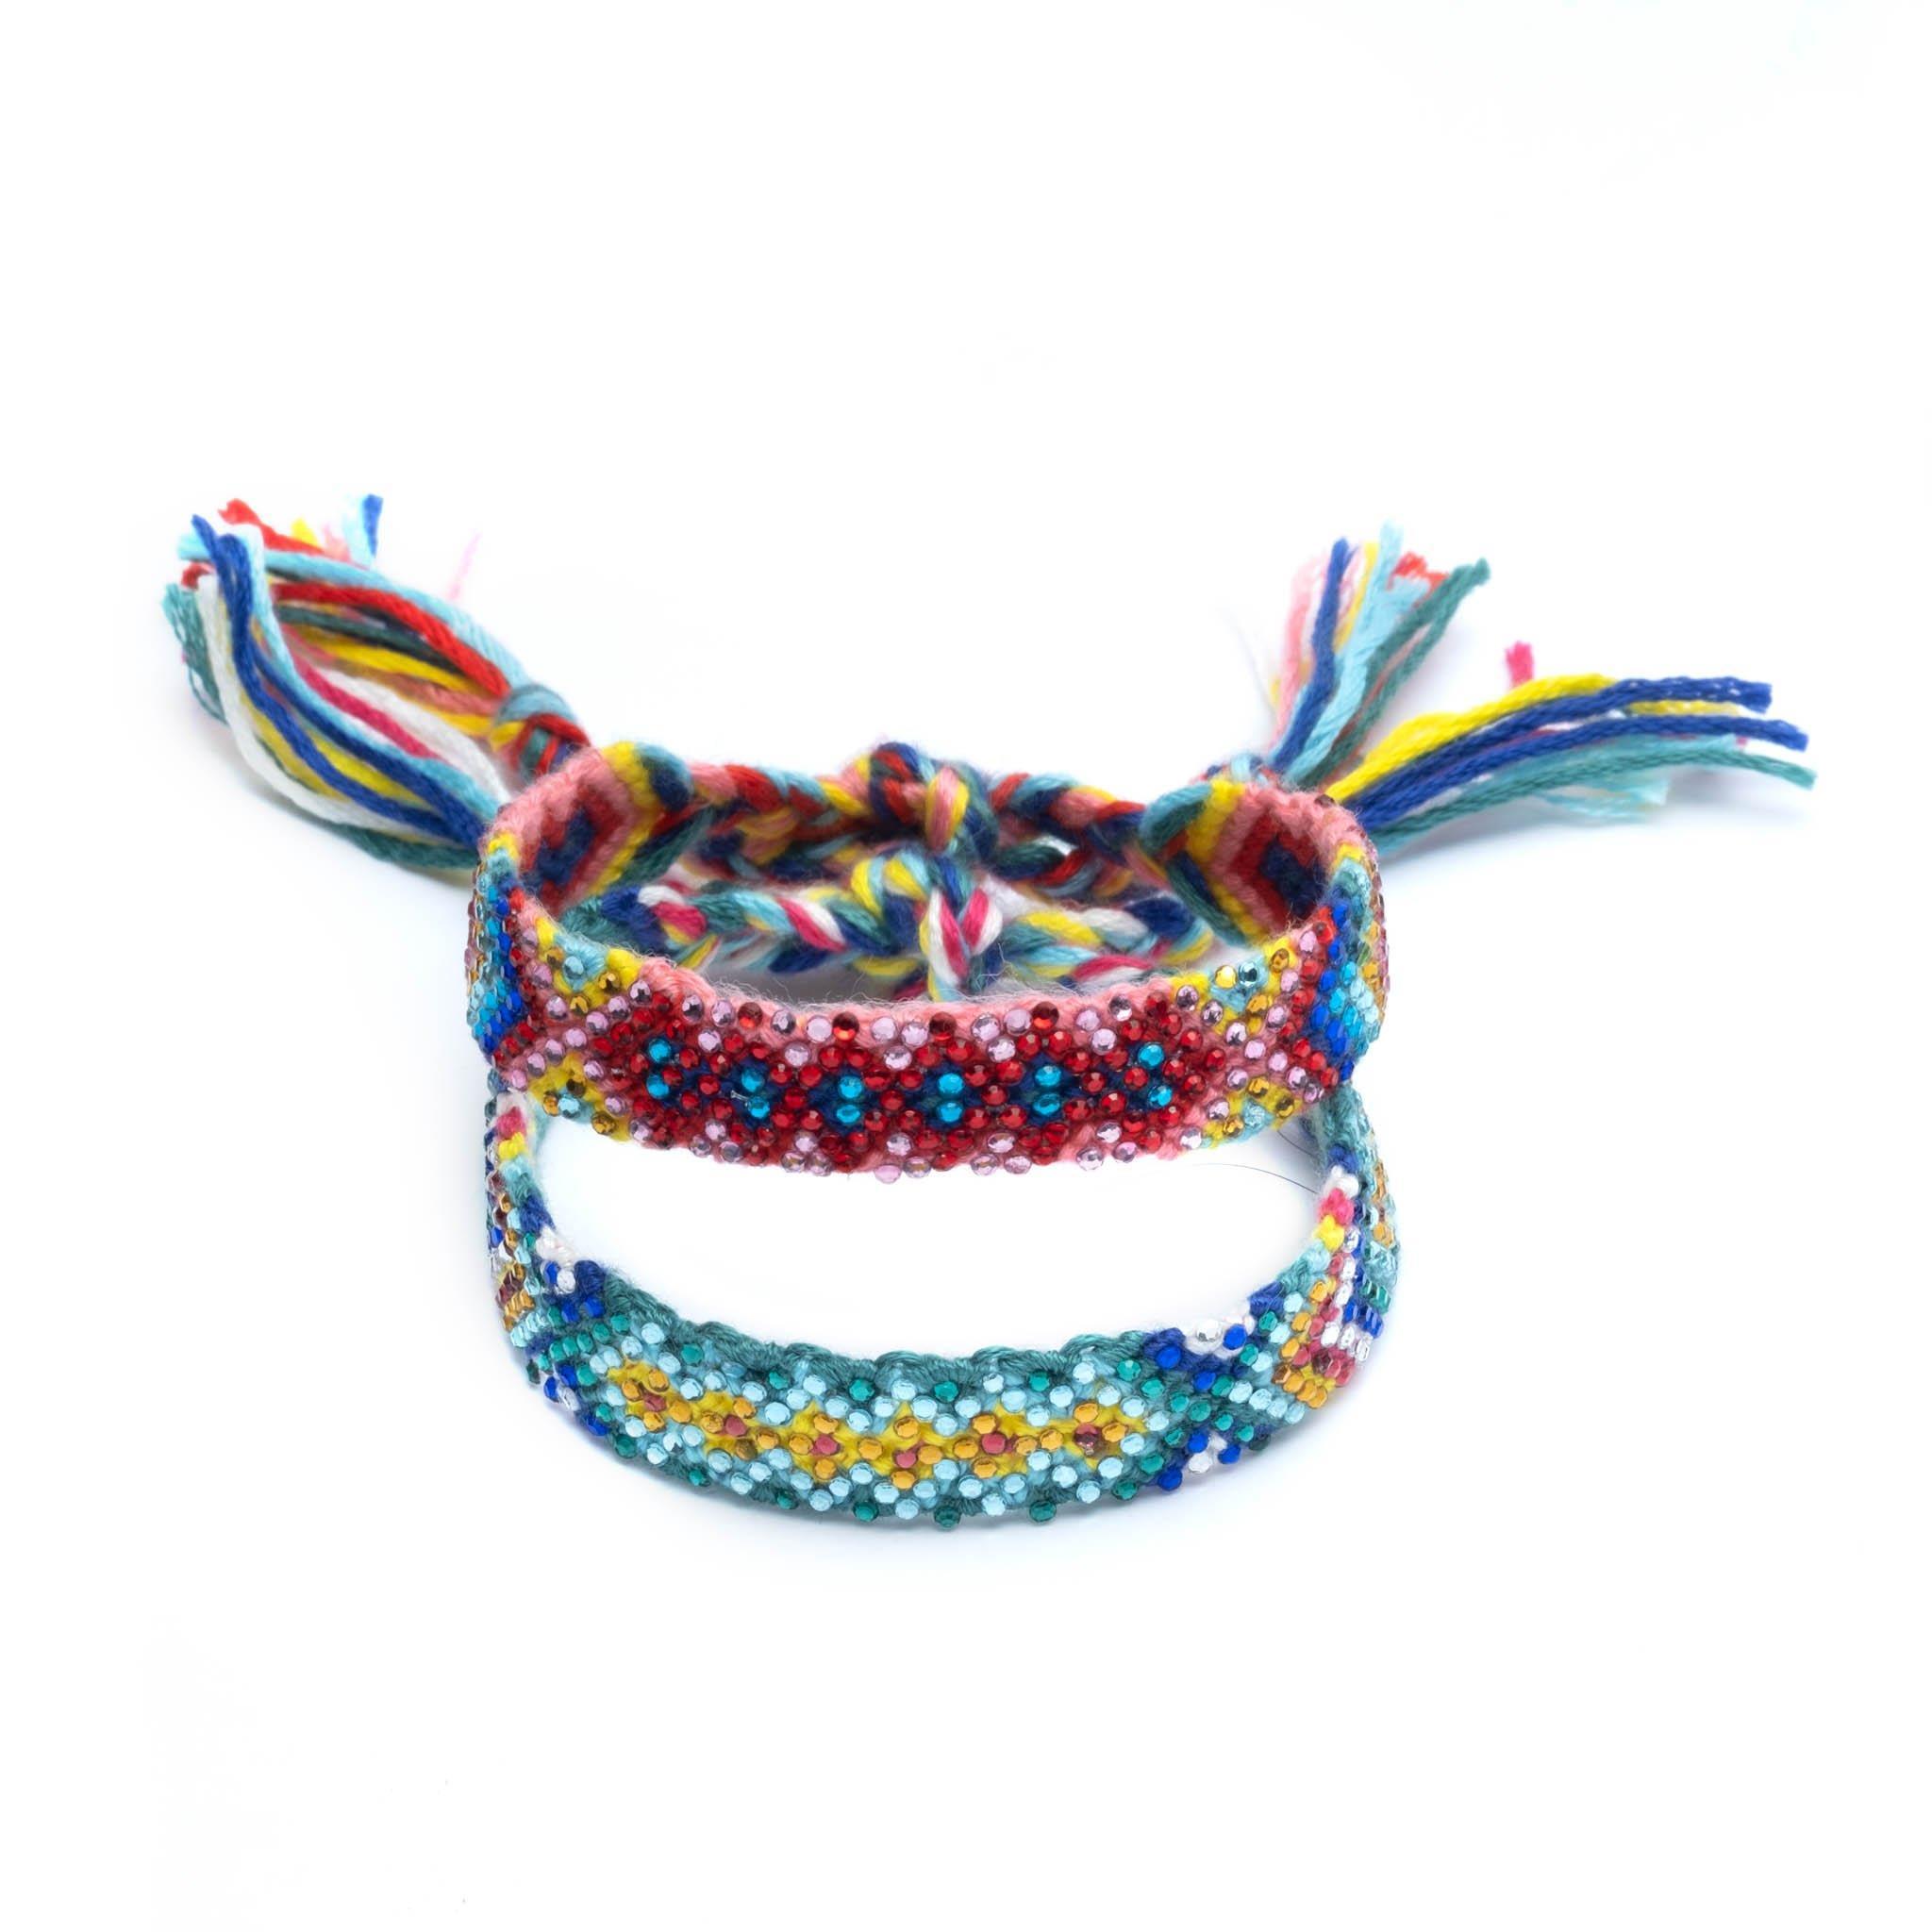 Dannijo Sydney and Riley Friendship Bracelet Set